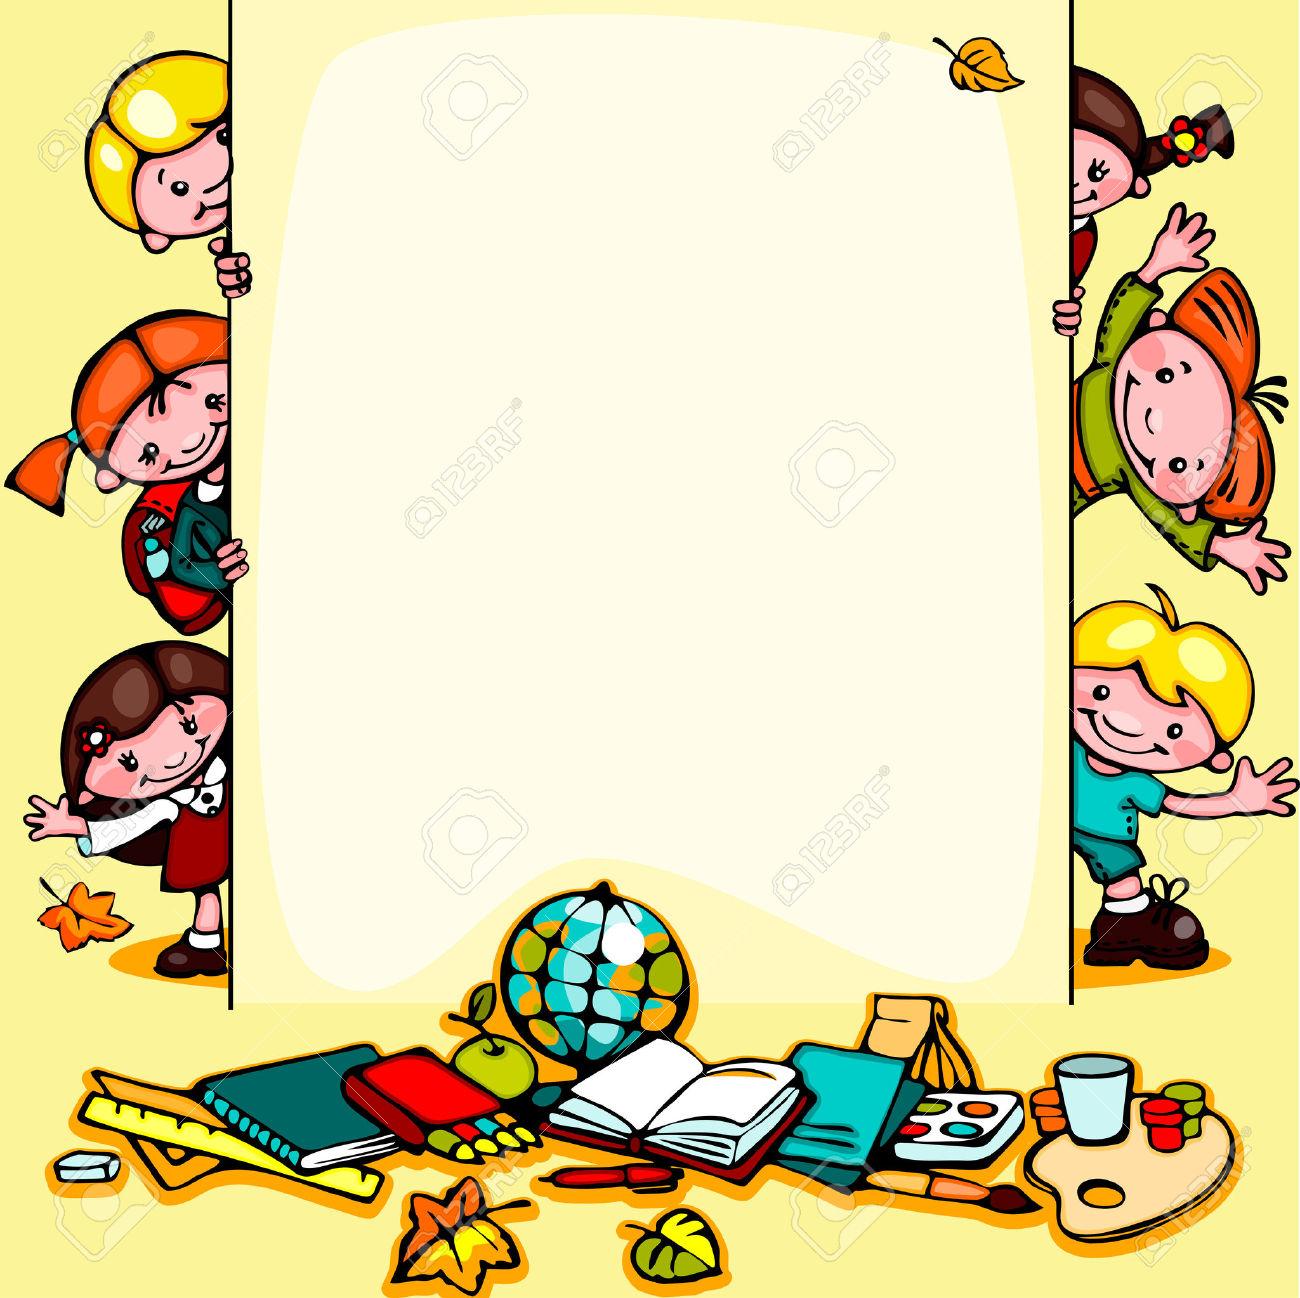 Cartoon teacher border clipart clip transparent library Education Border Cliparts | Free download best Education Border ... clip transparent library